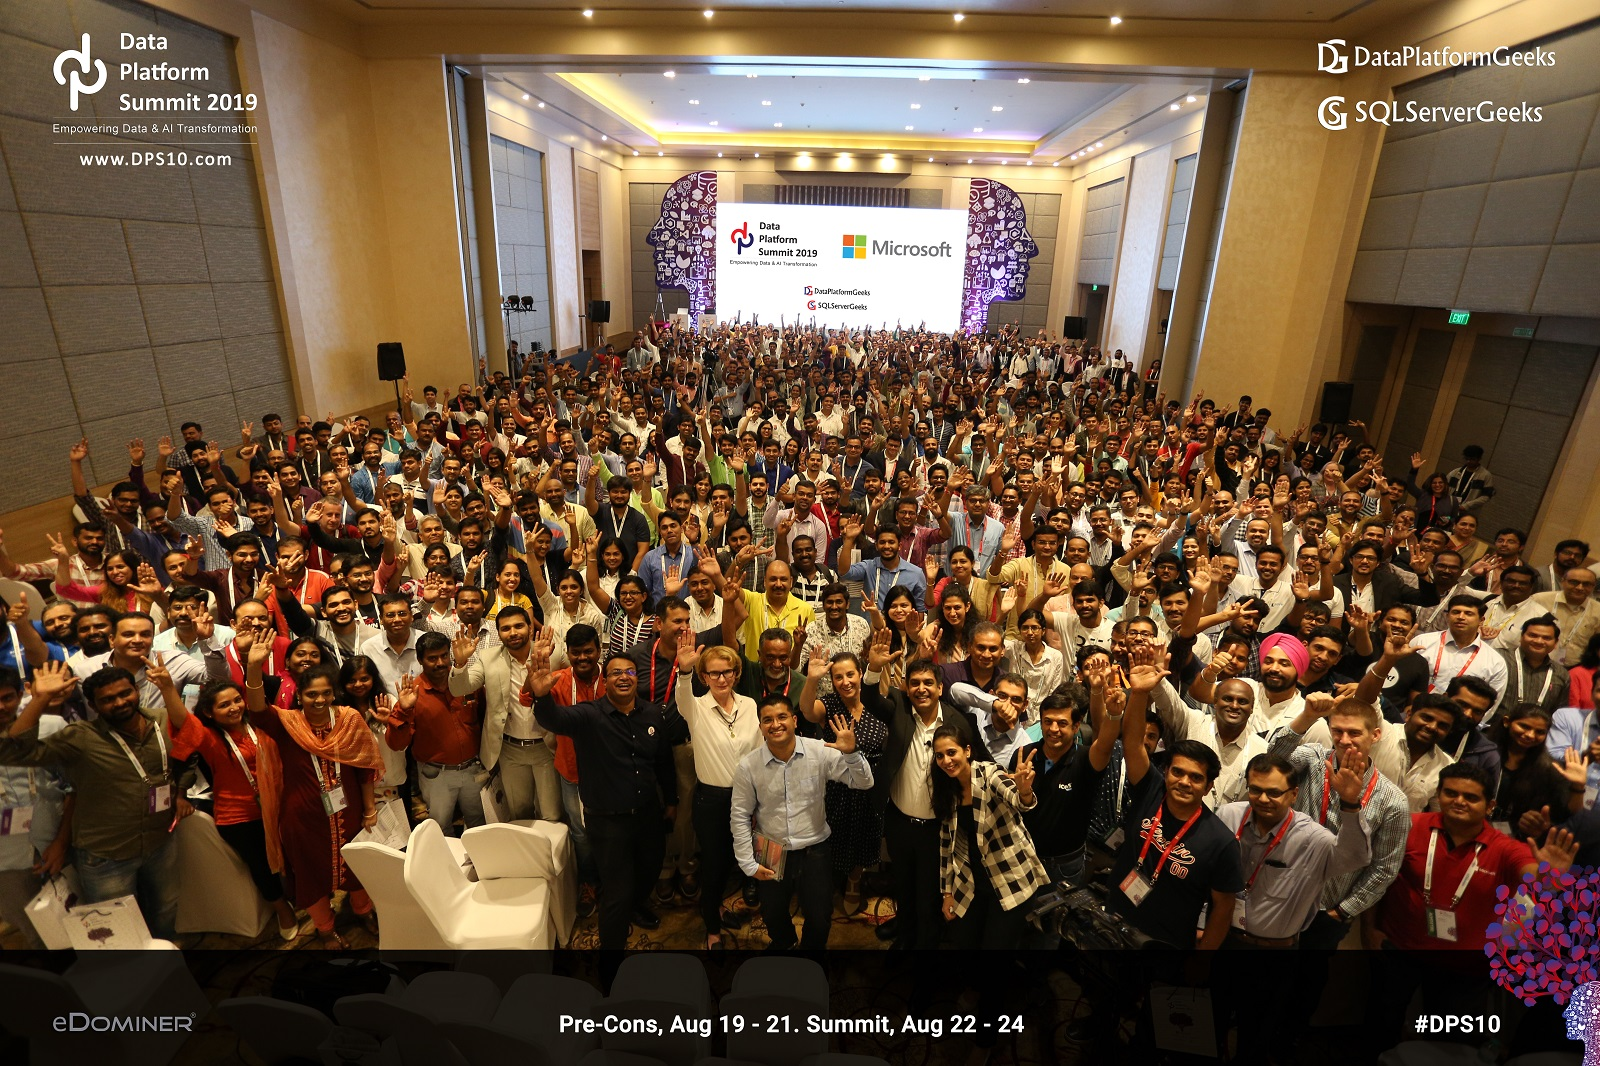 Data Platform Summit 2019 Group Photo